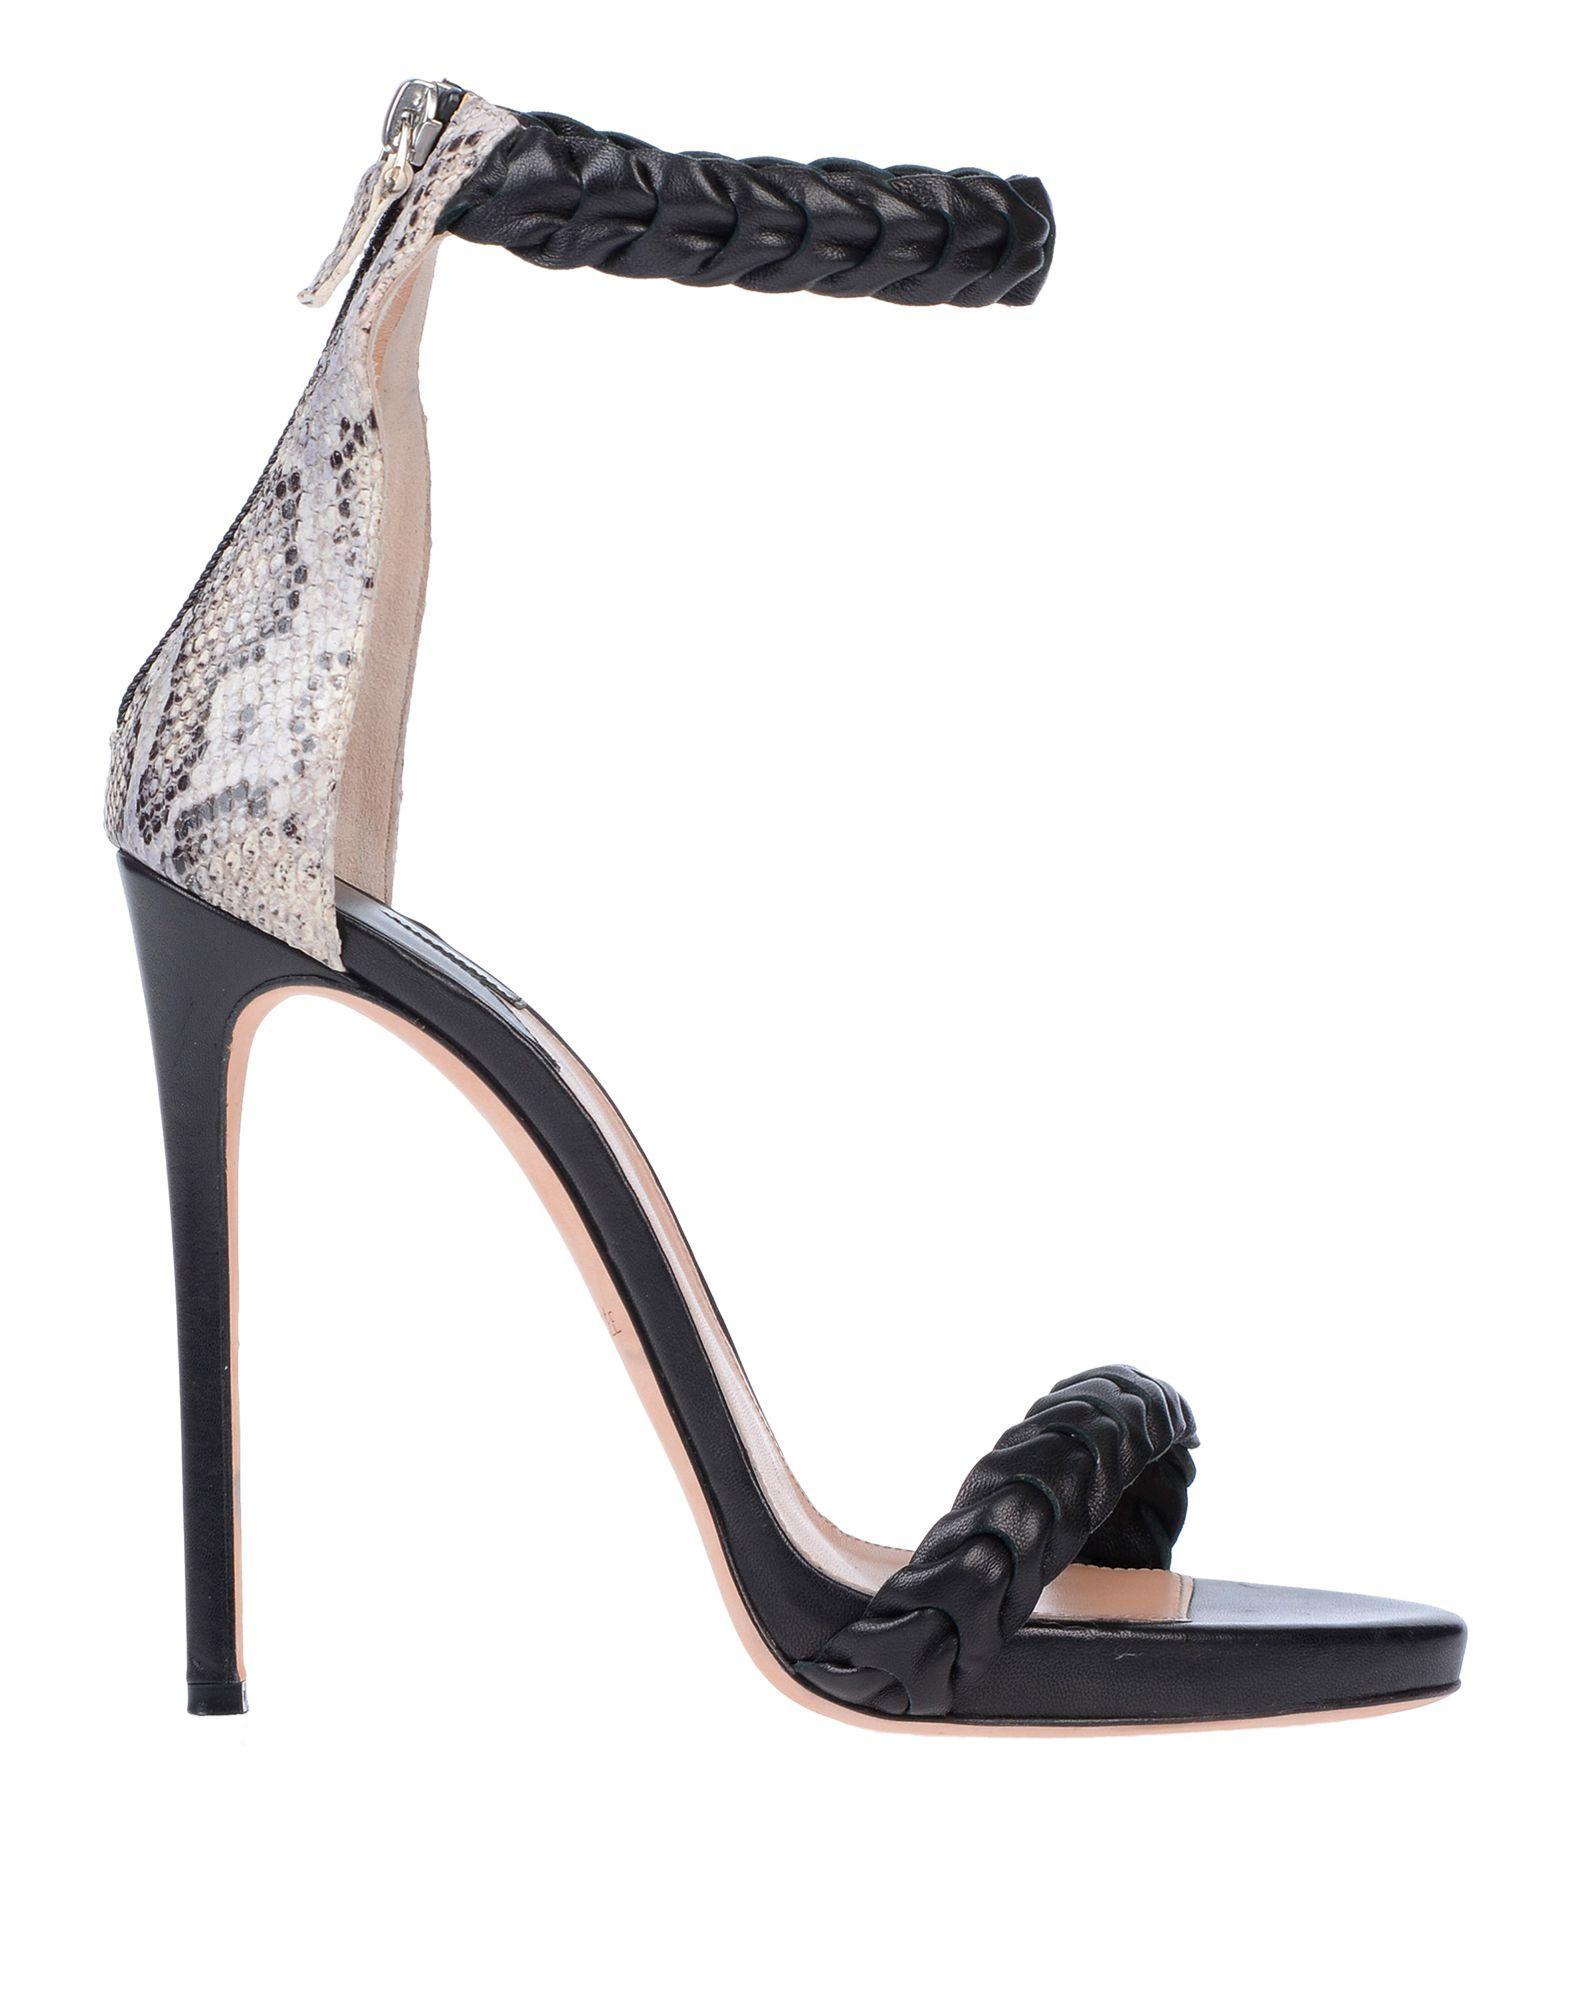 Racine Carree Black Leather Heels